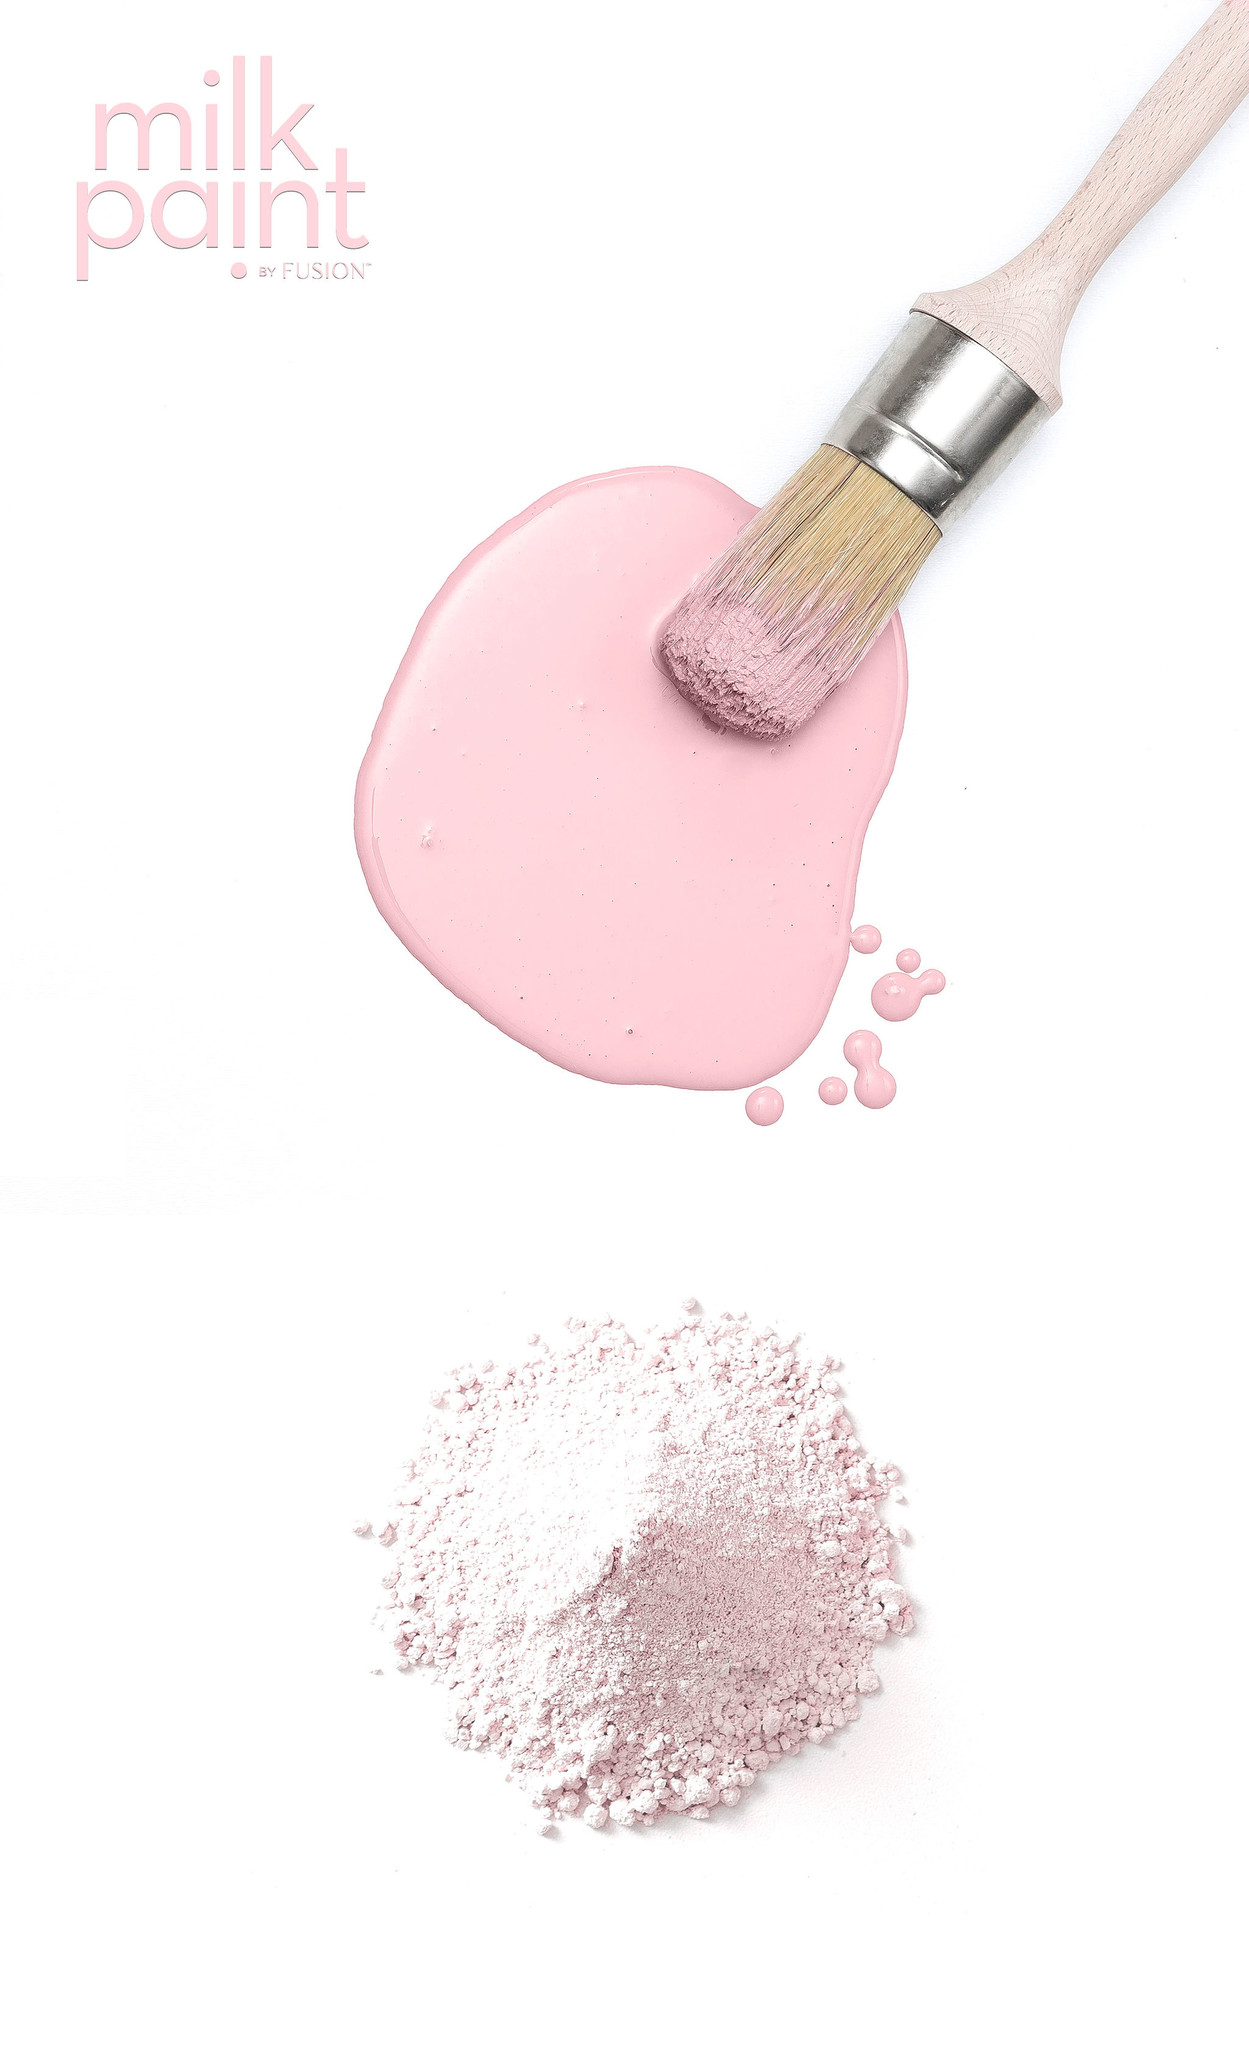 Fusion Mineral Paint Fusion - Milk Paint - Millennial Pink - 330gr